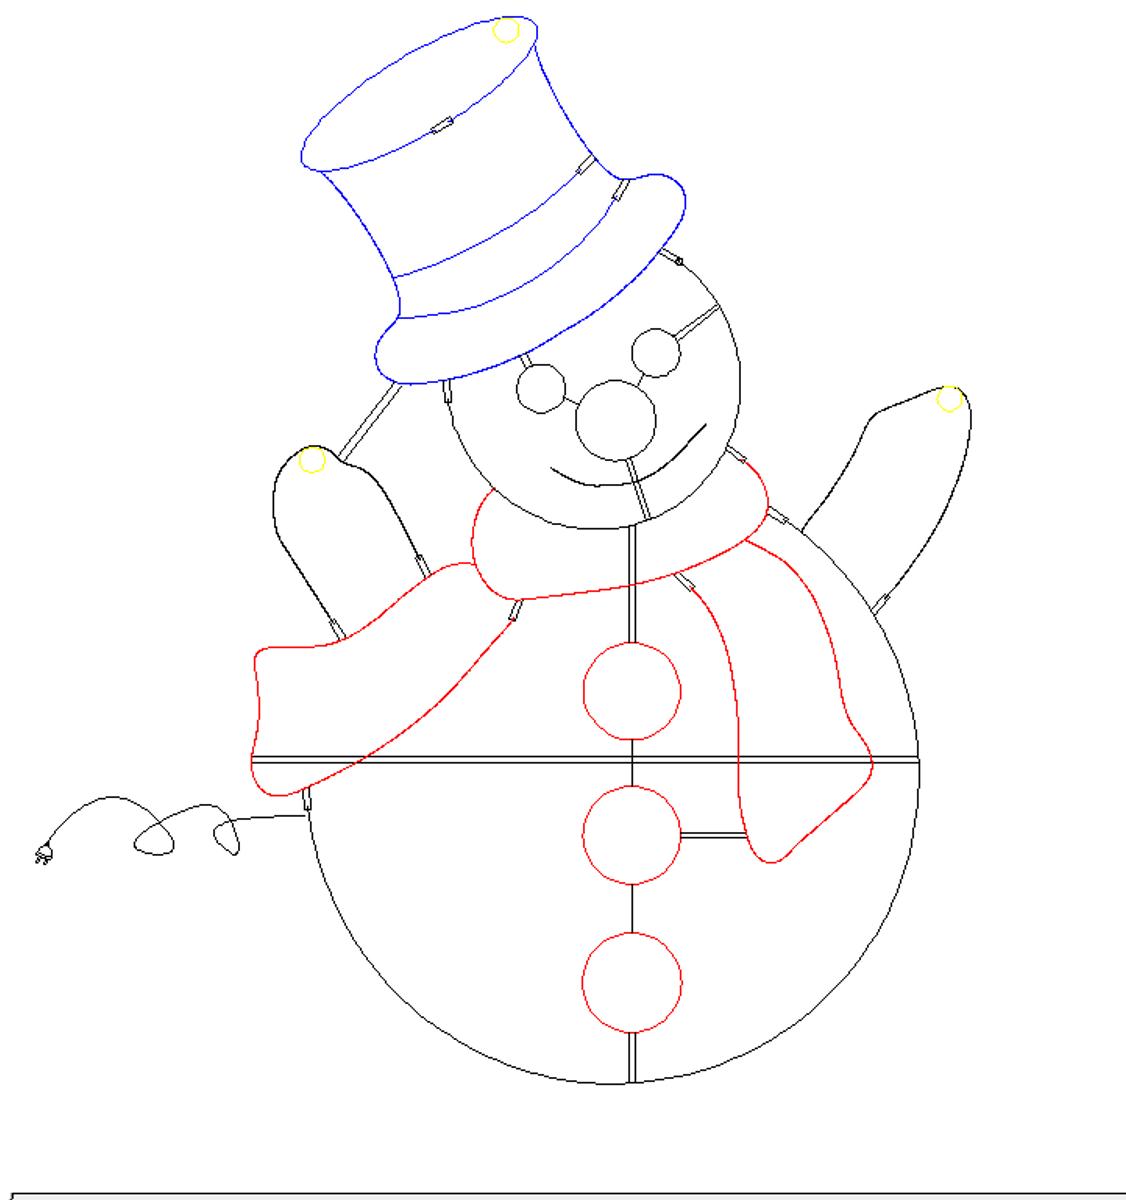 Snømann 120x80 cm kaldhvit